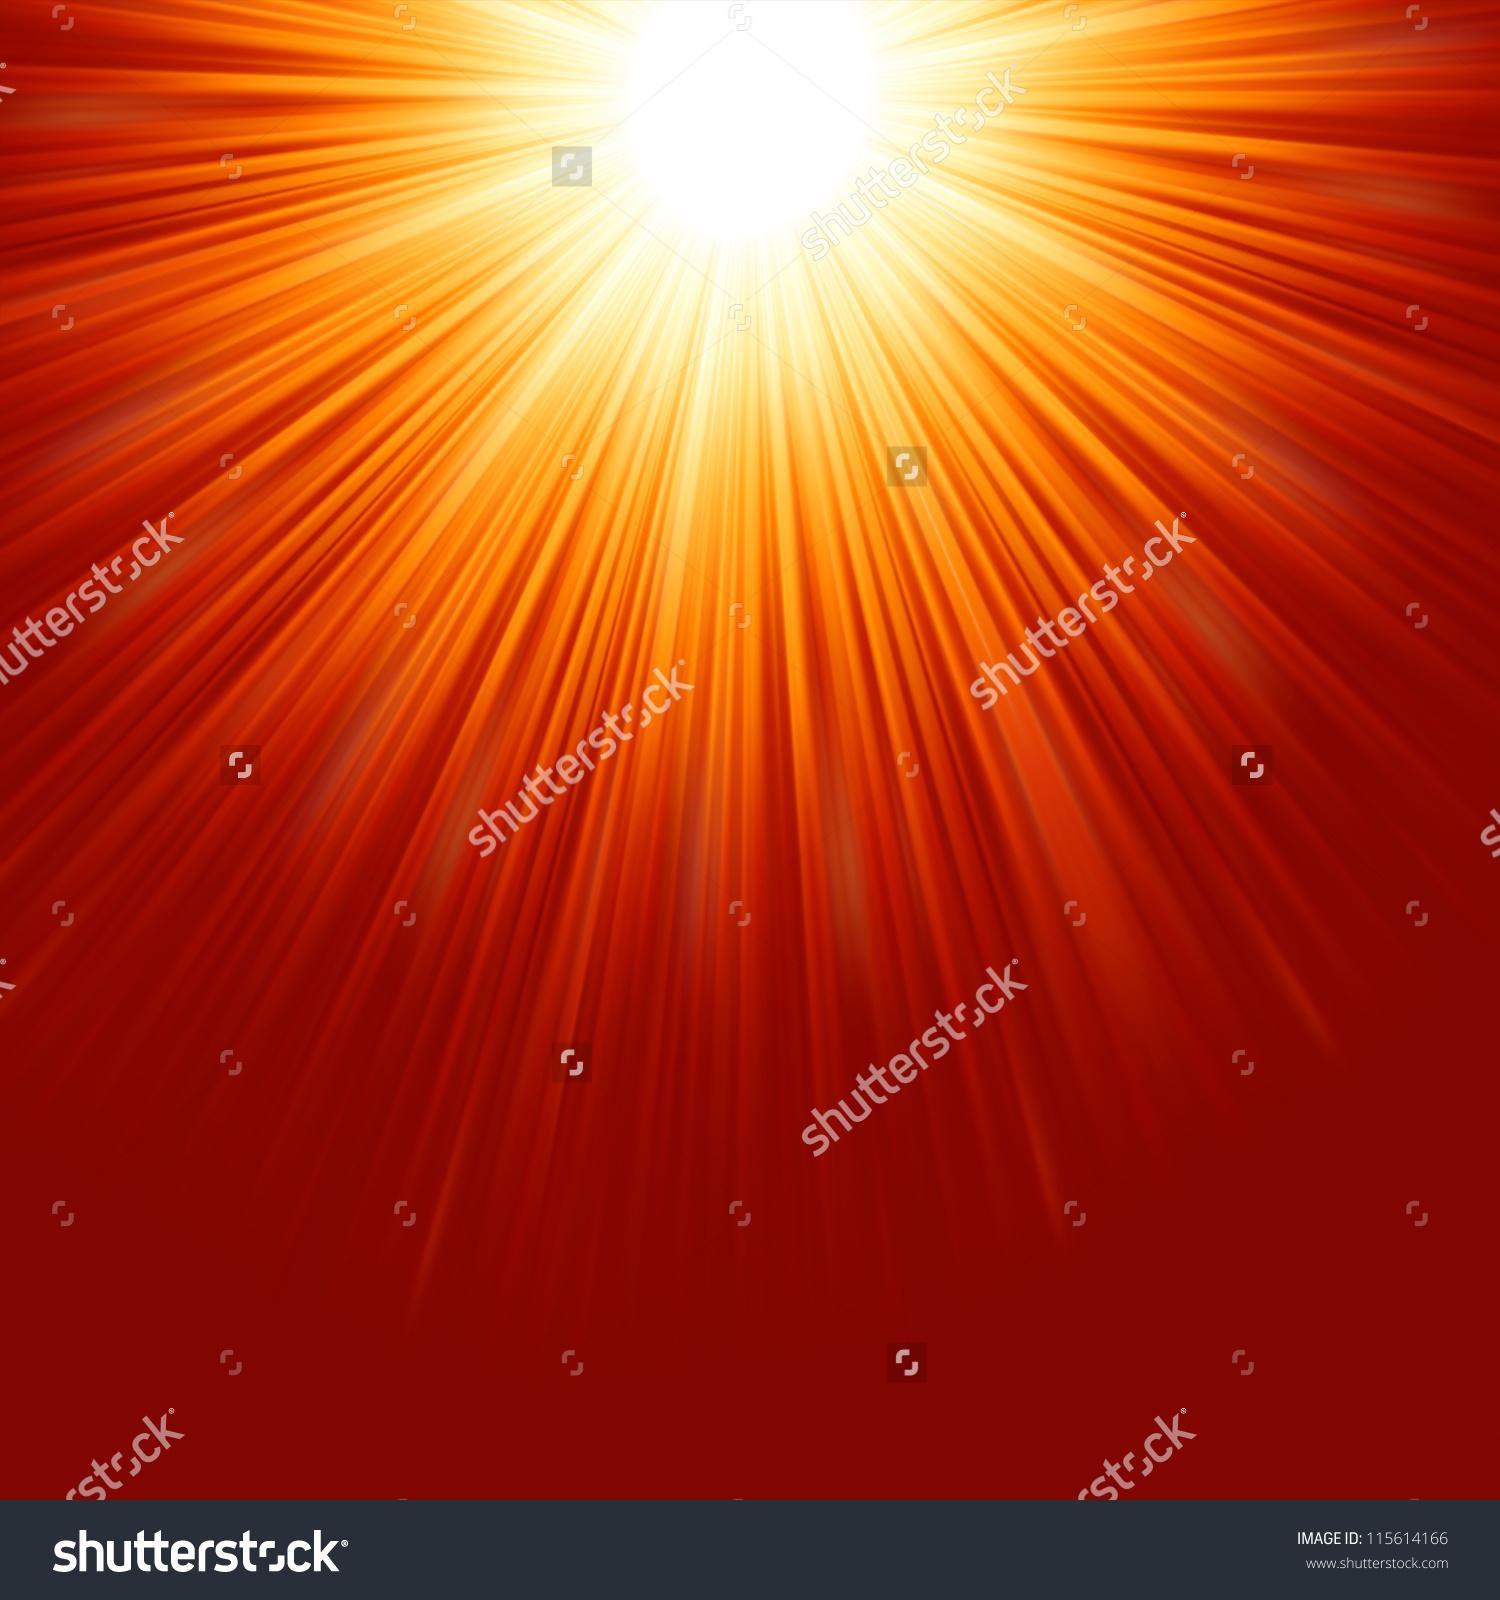 Radiant star clipart.